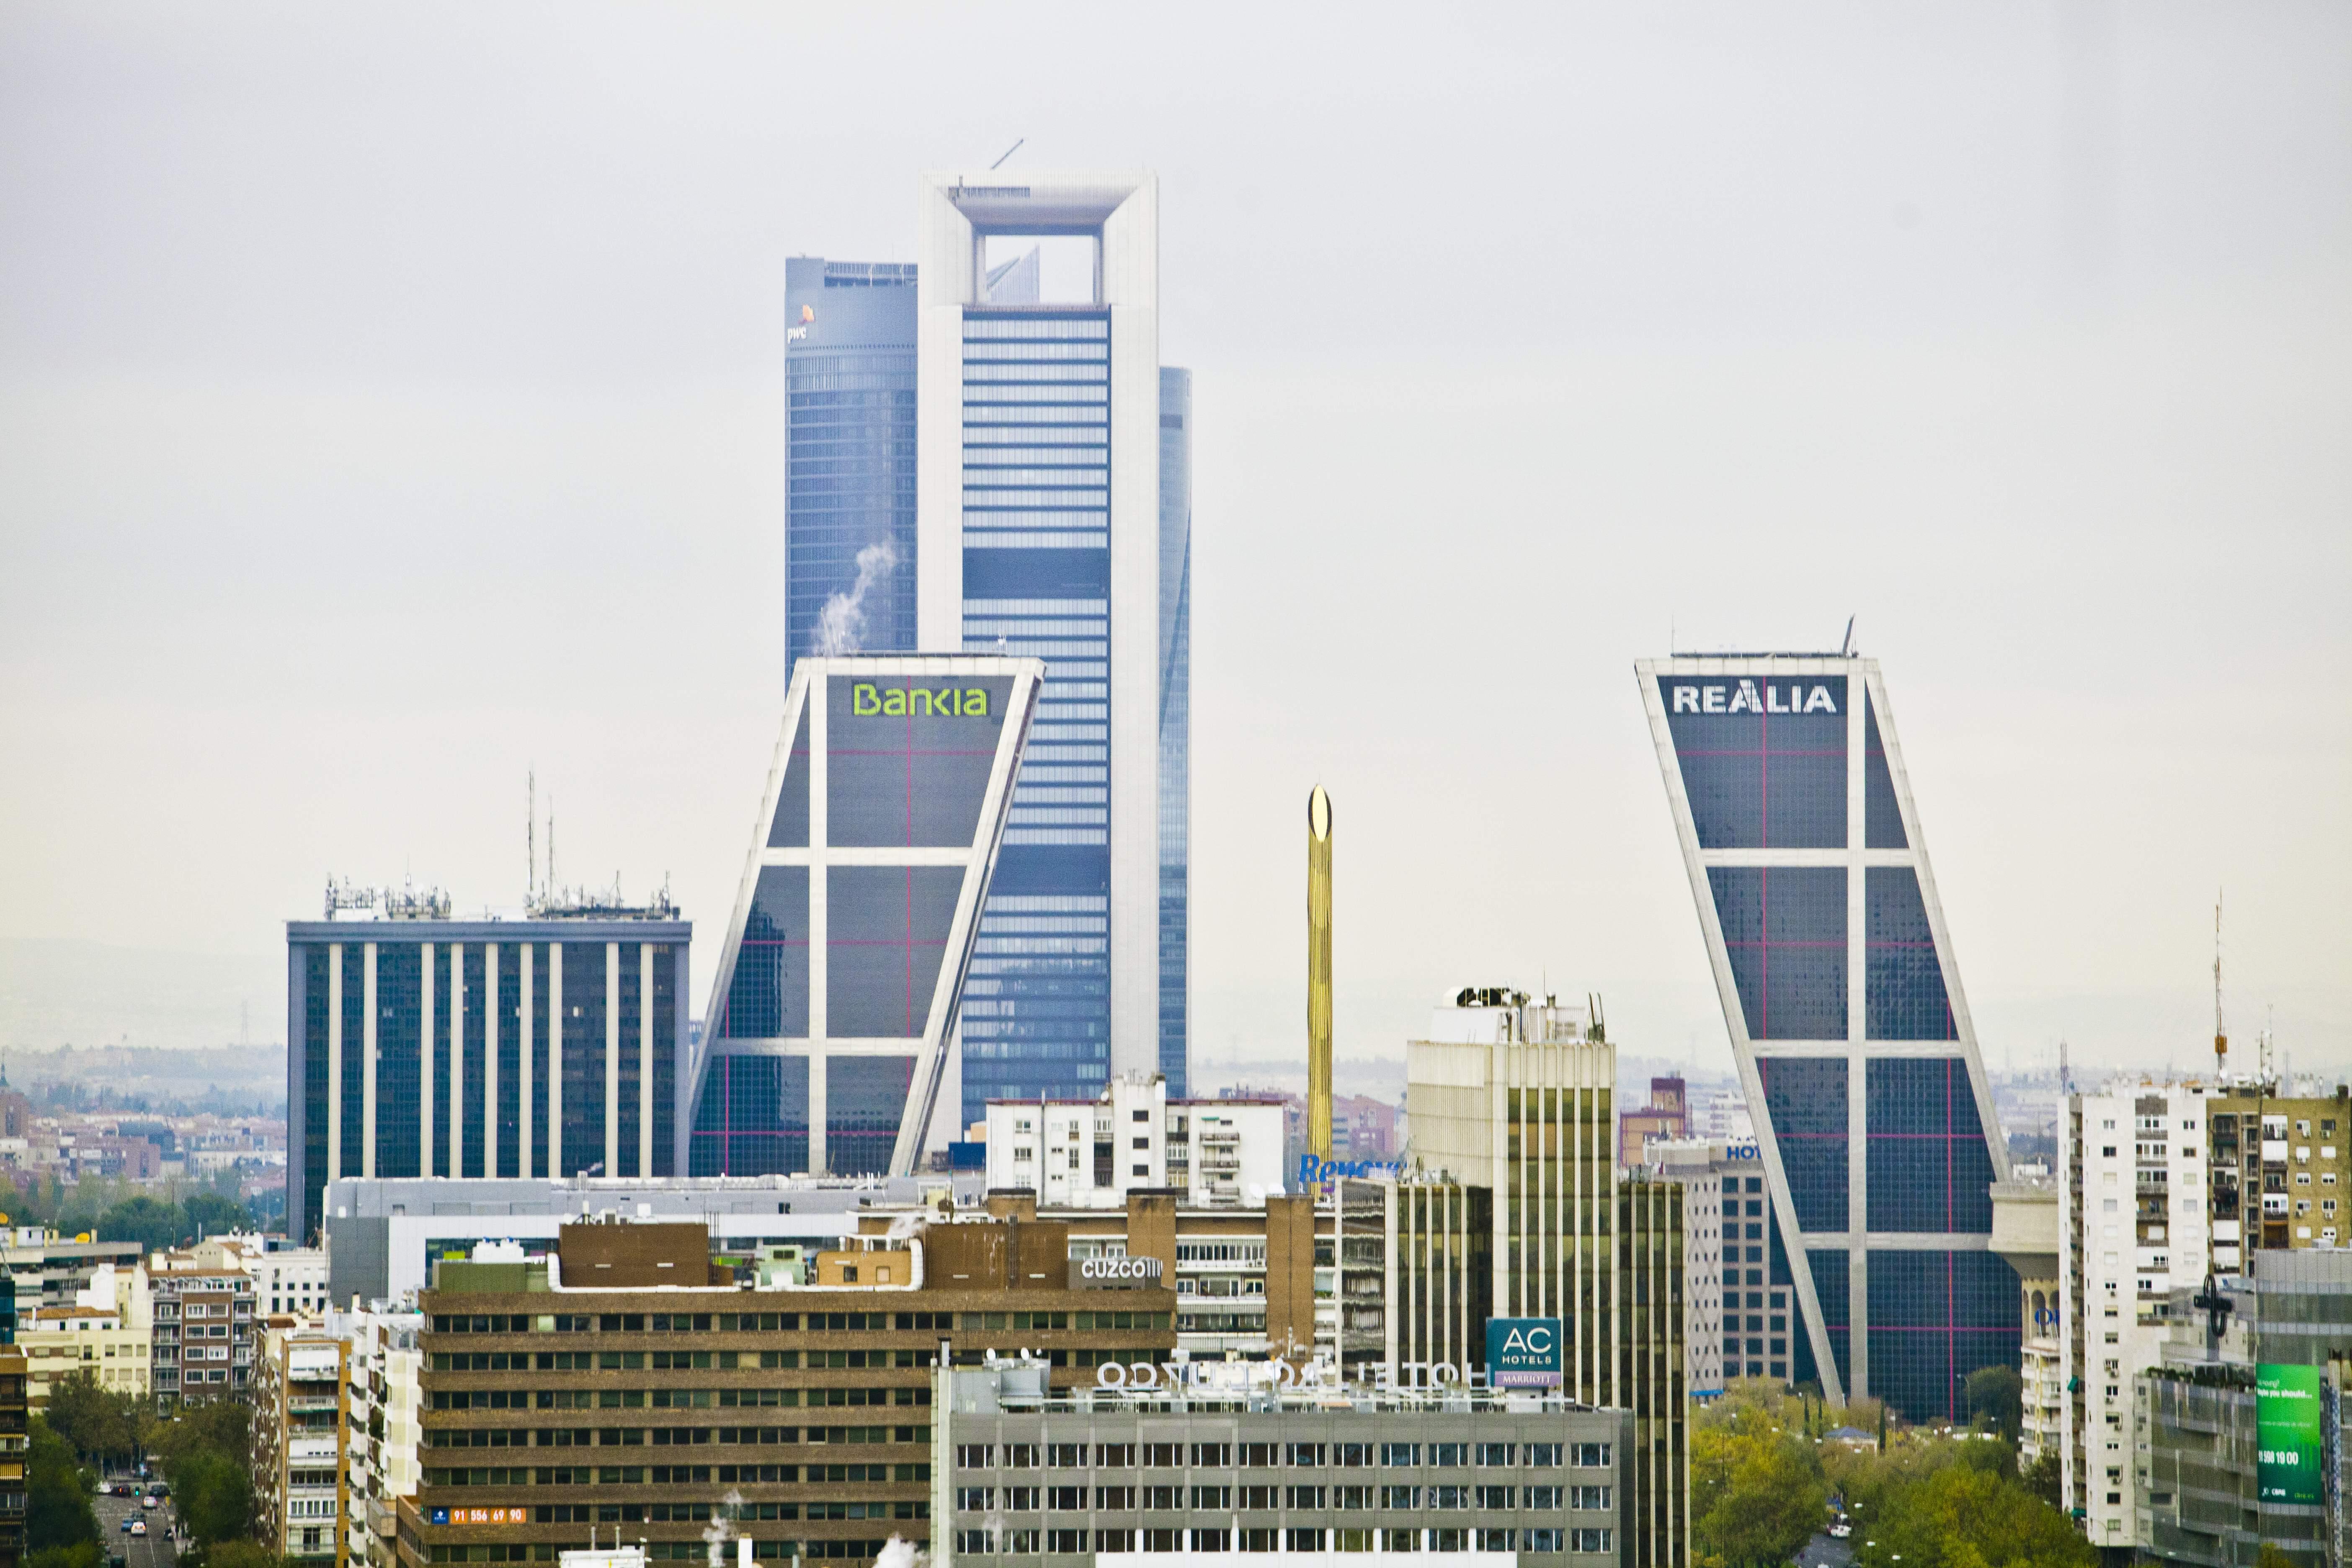 Bankia Torres Kio Madrid